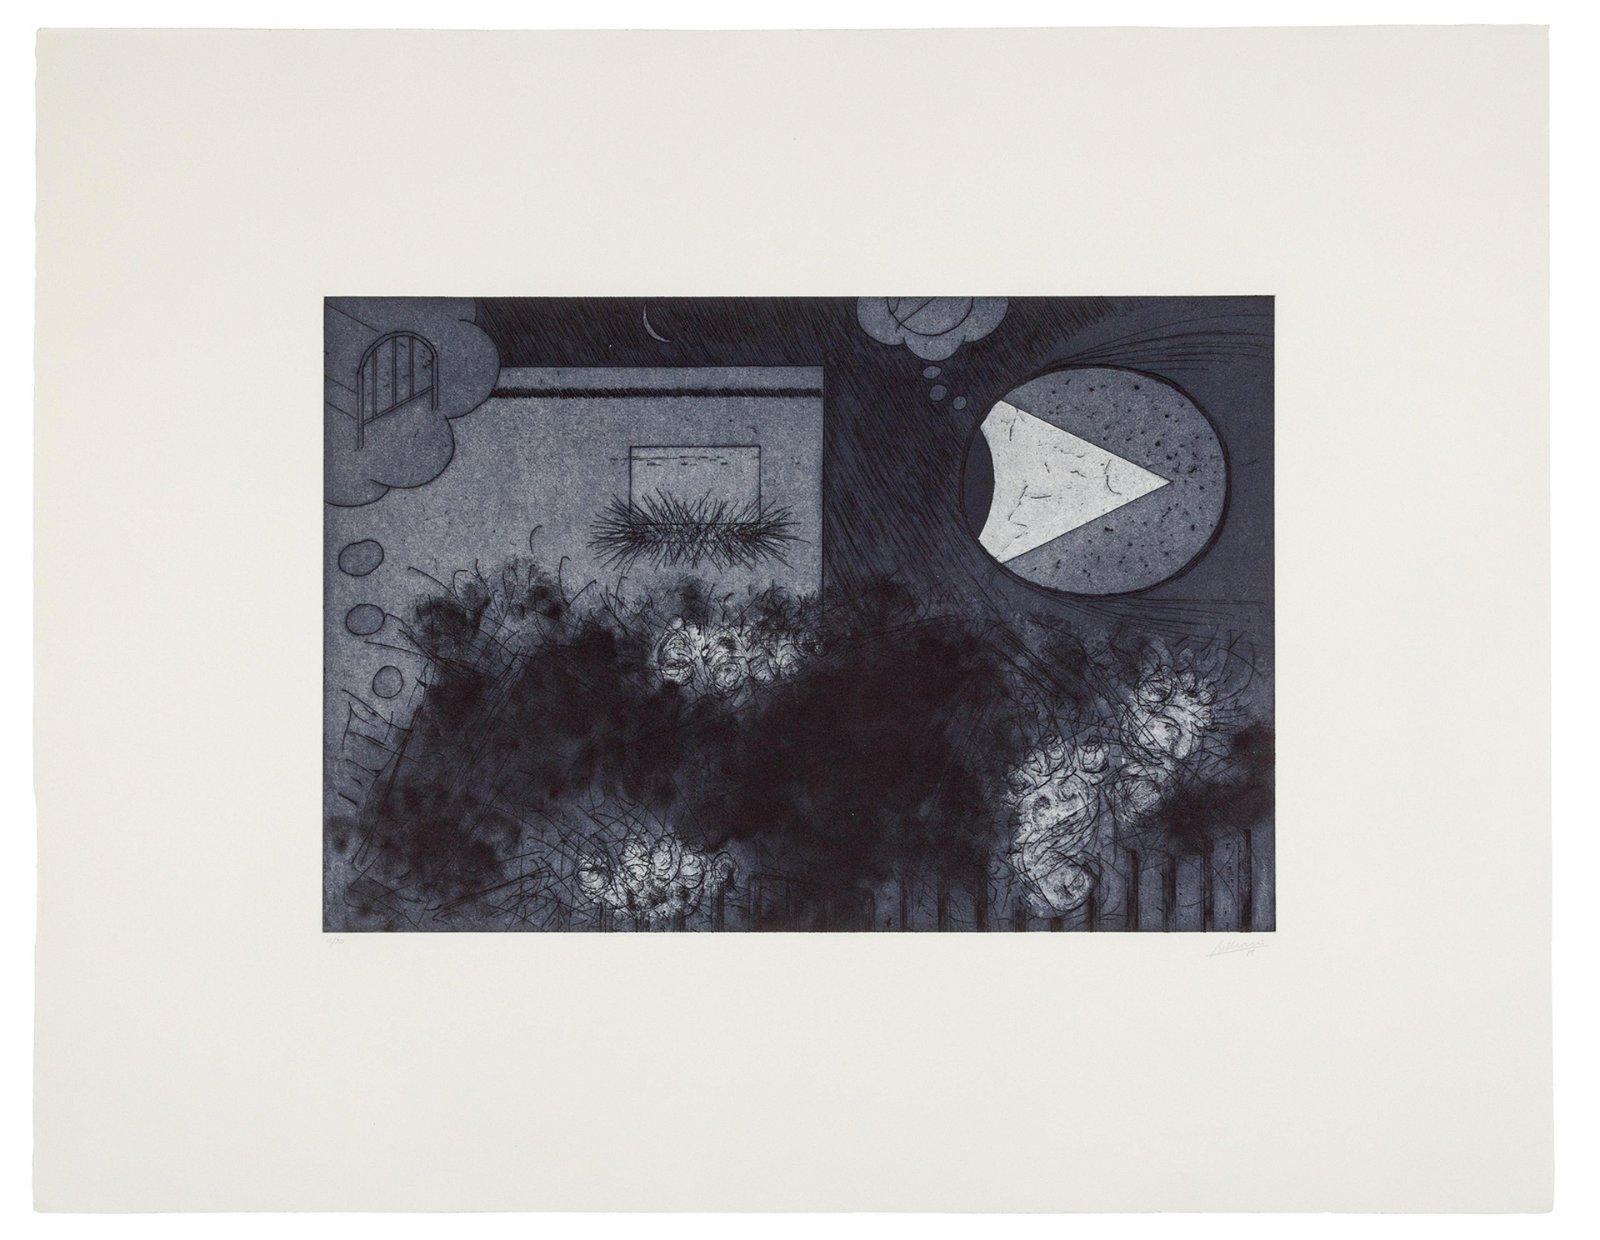 Robert Morris (American, b. 1931) Untitled, 1988